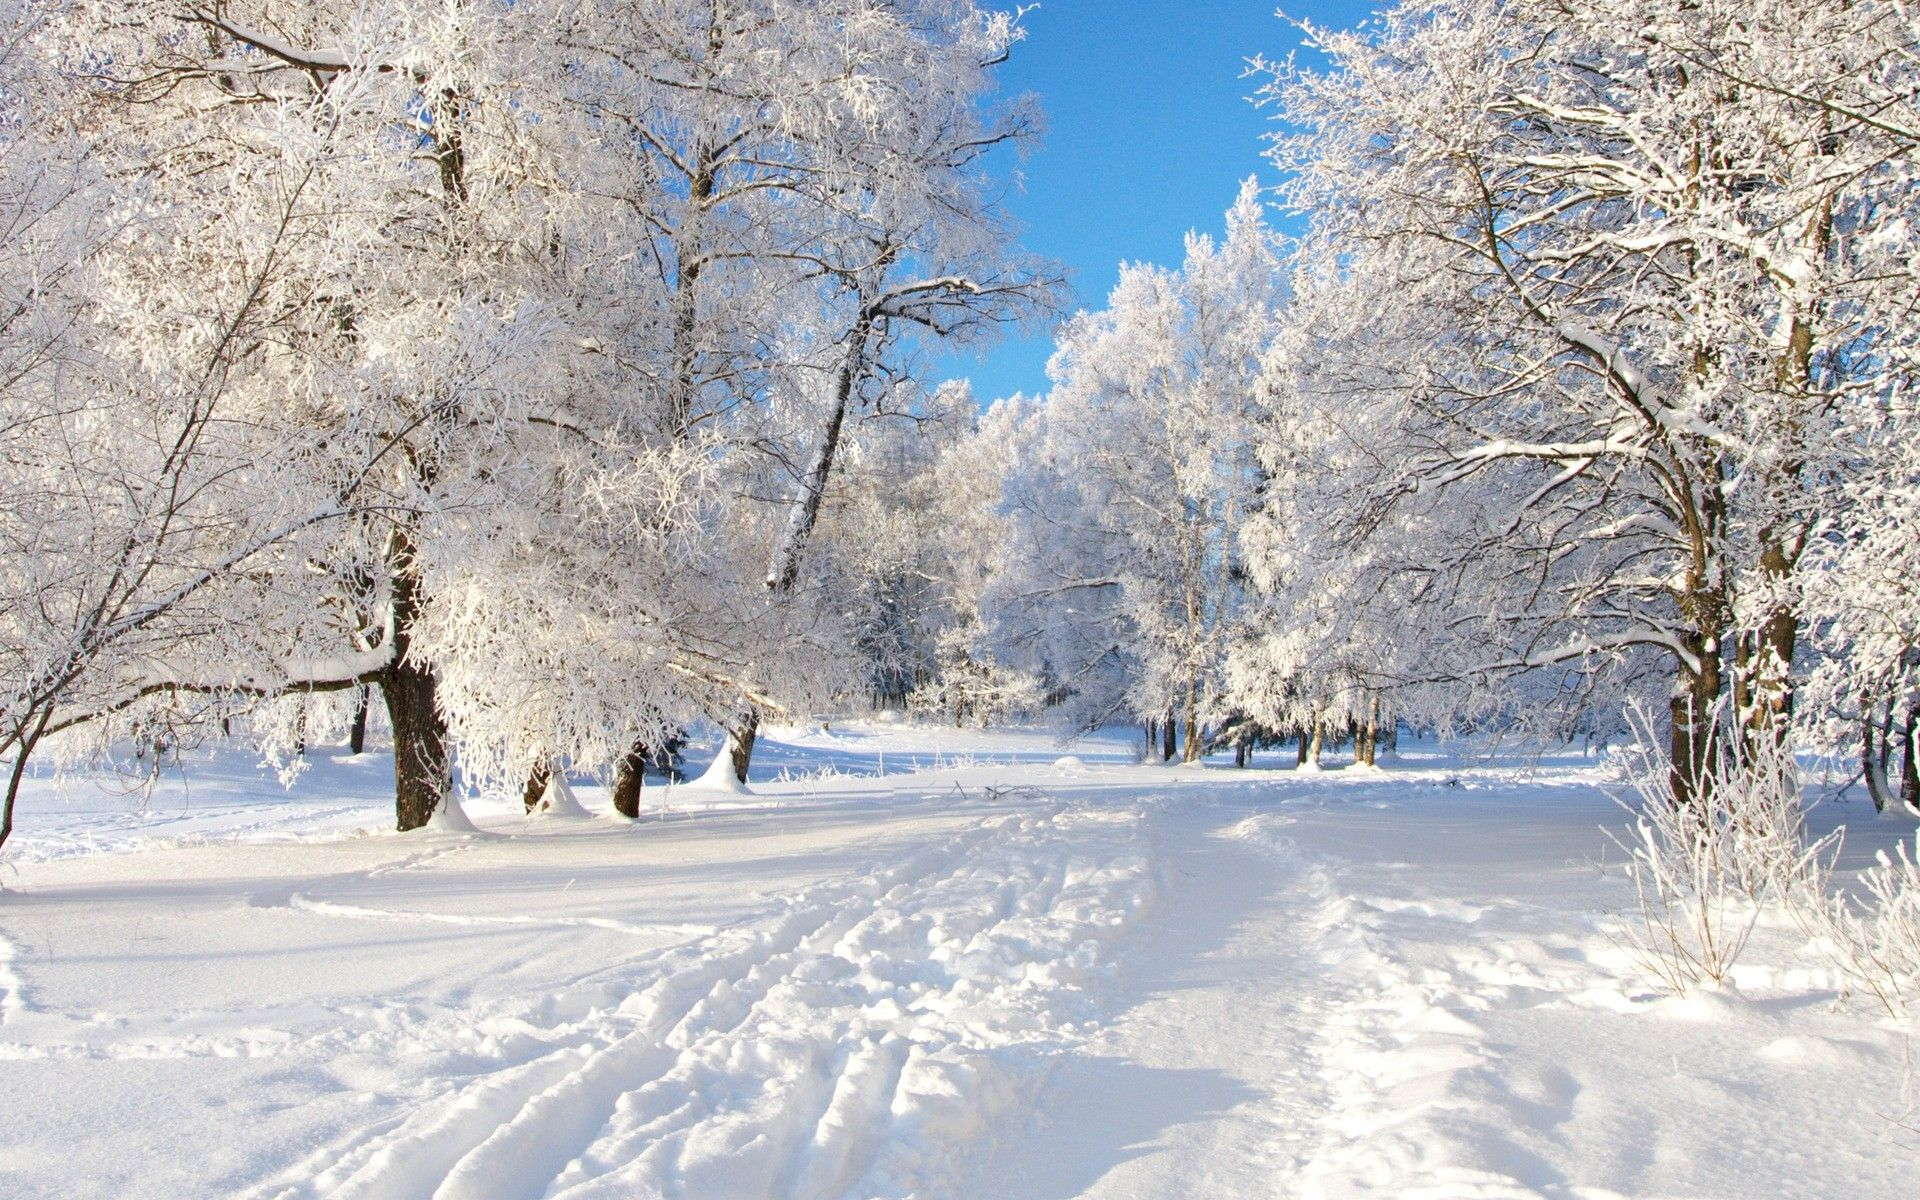 Winter hd desktop wallpapers top free winter hd desktop - Winter desktop ...